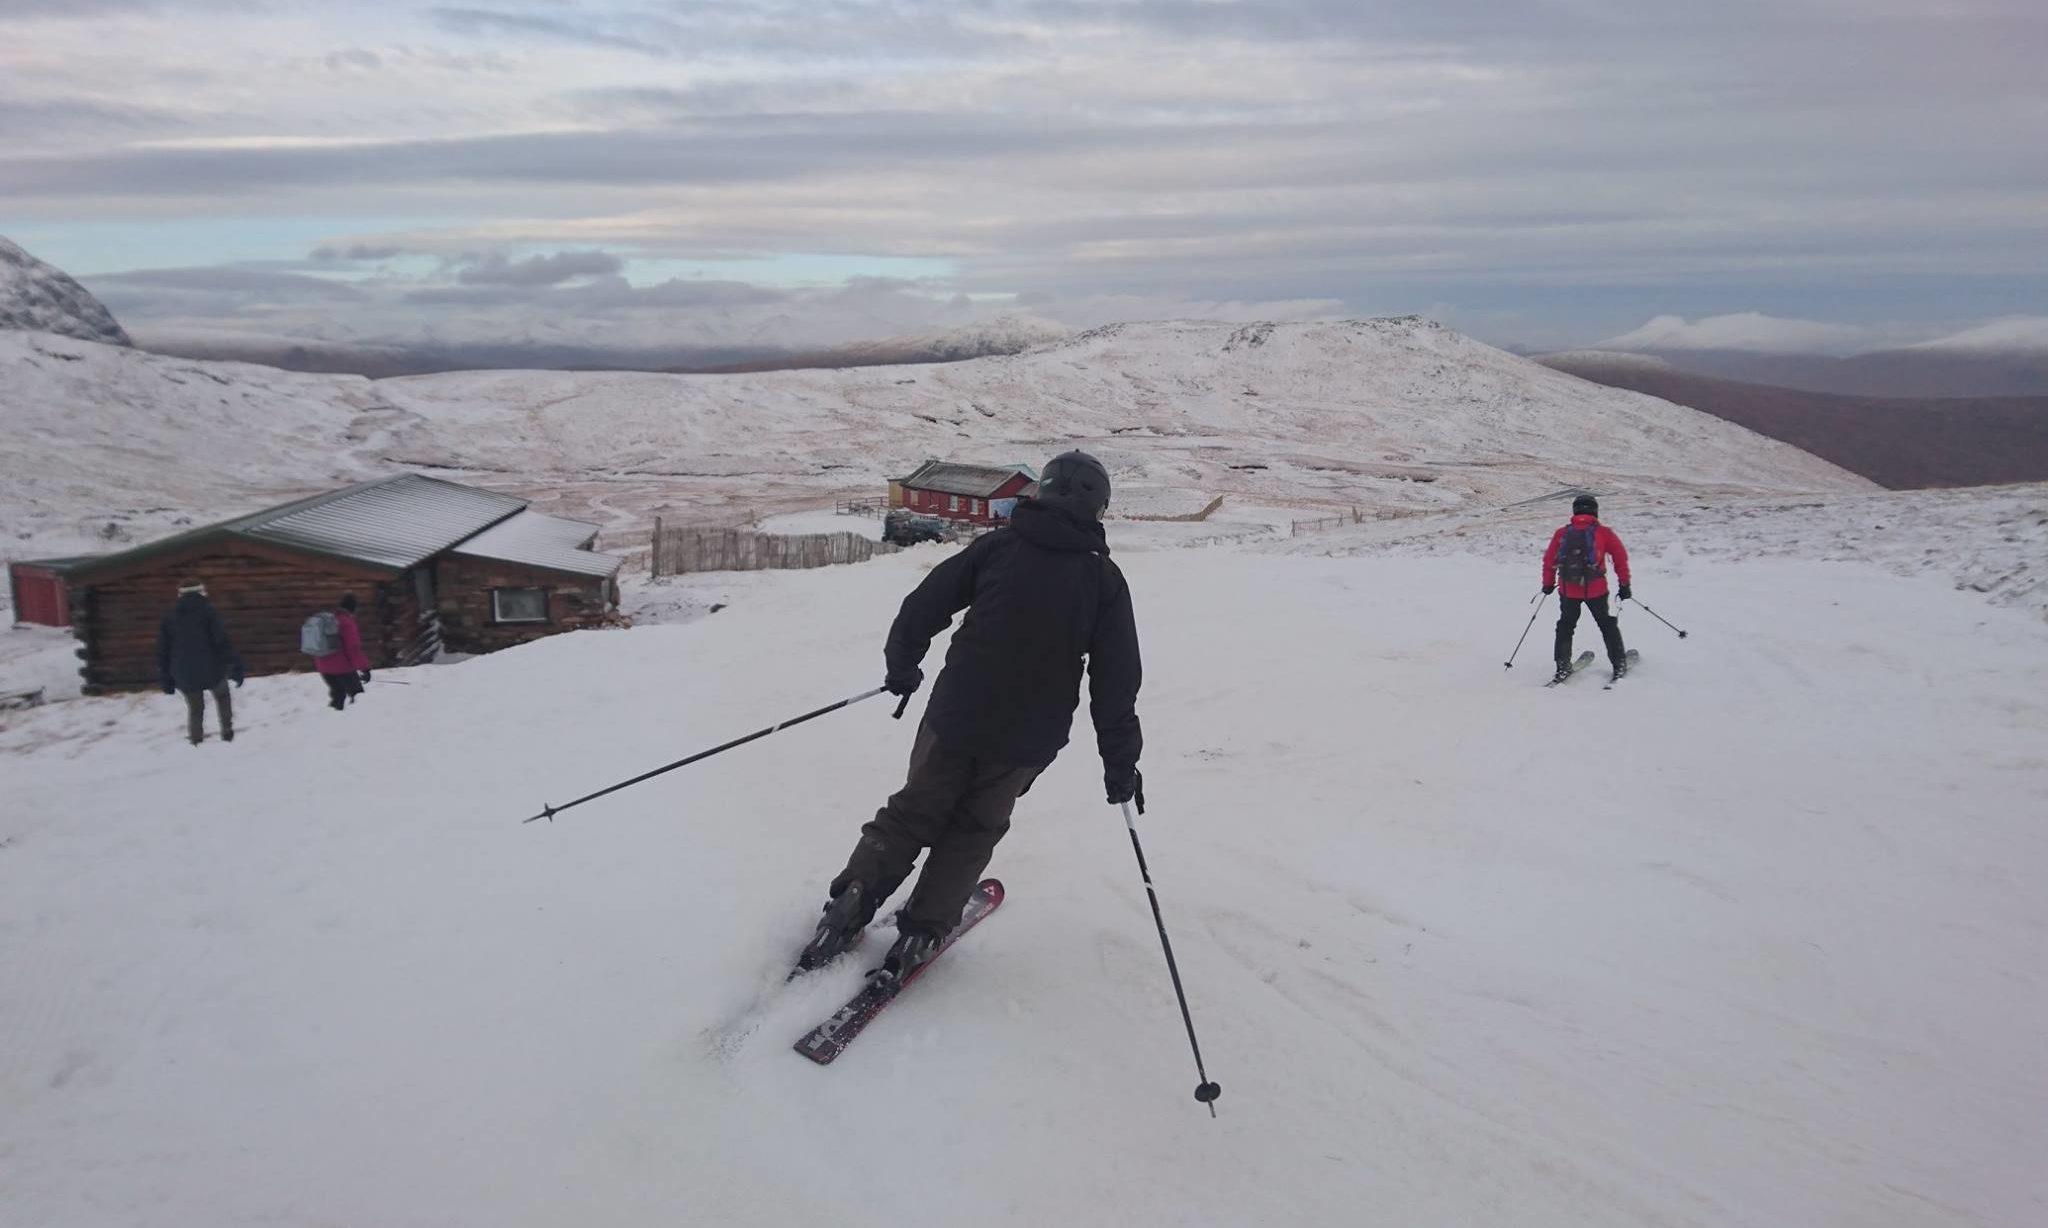 The ski season gets under way at Glencoe.